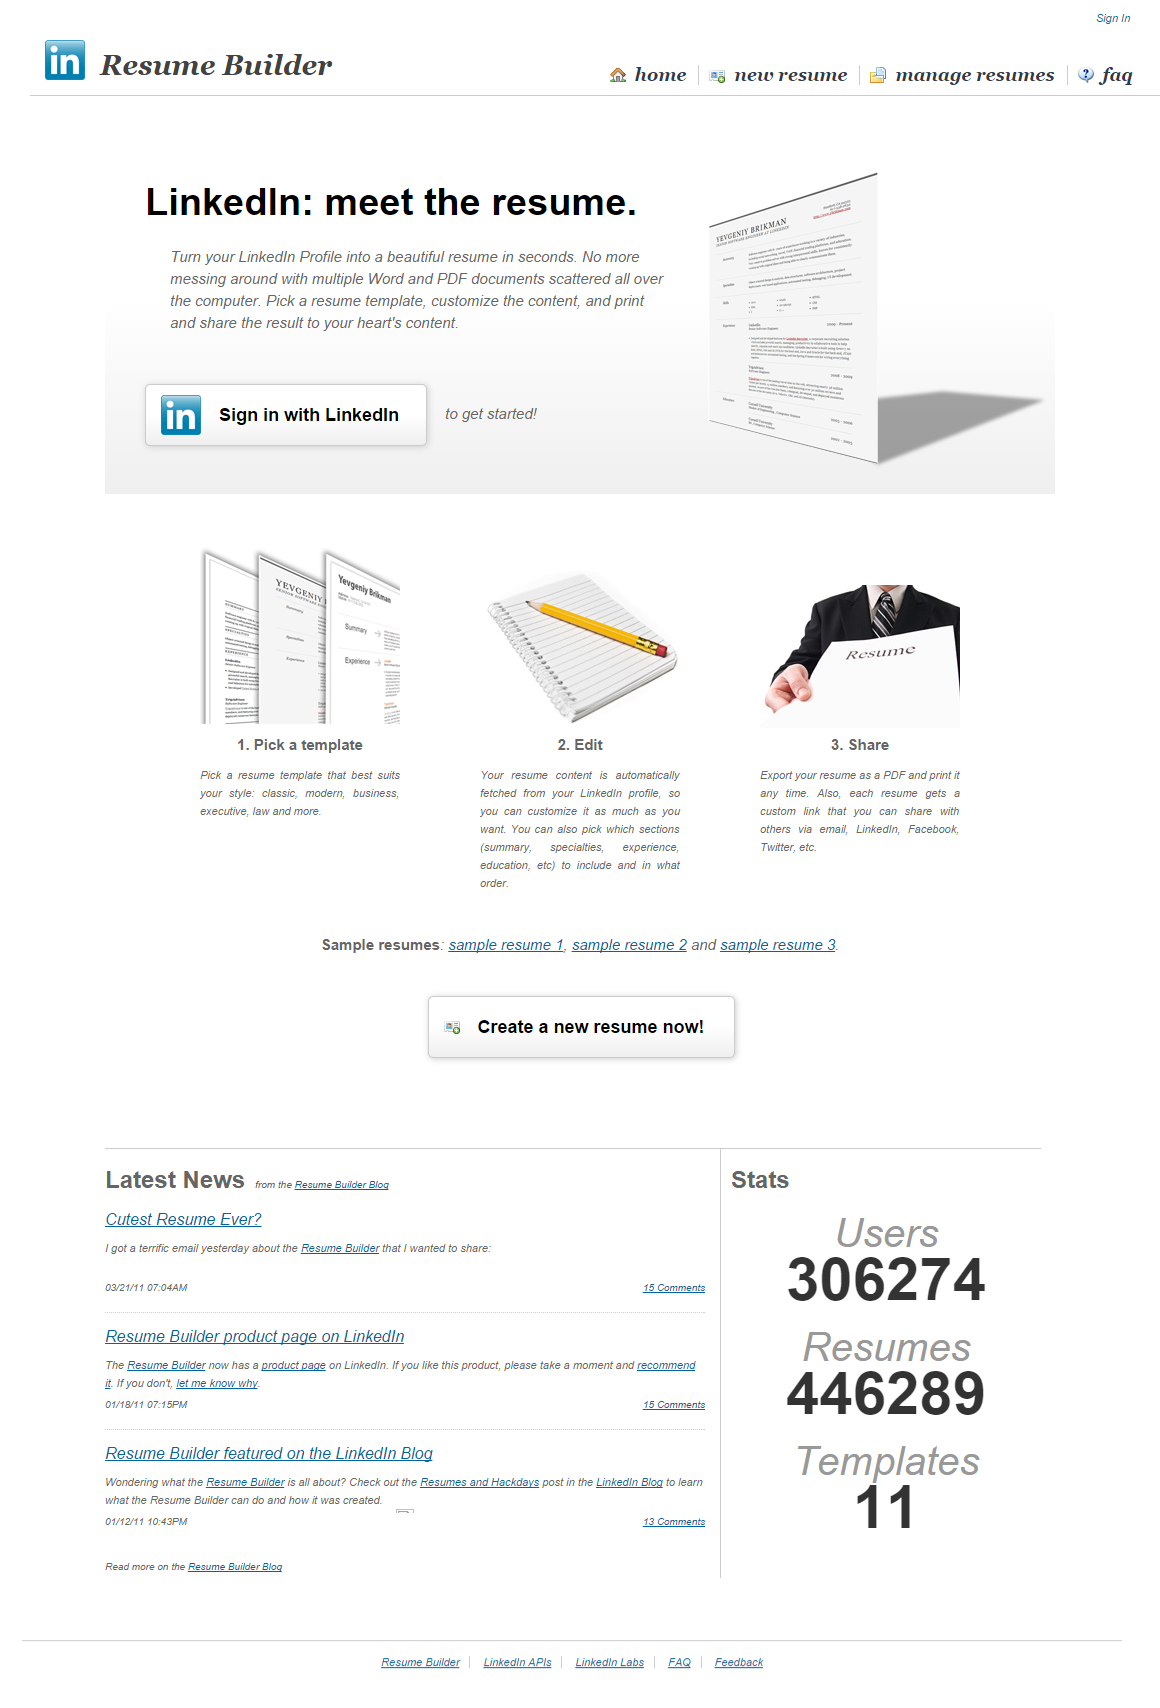 LinkedIn Resume Builder Resume builder, Resume, Resume